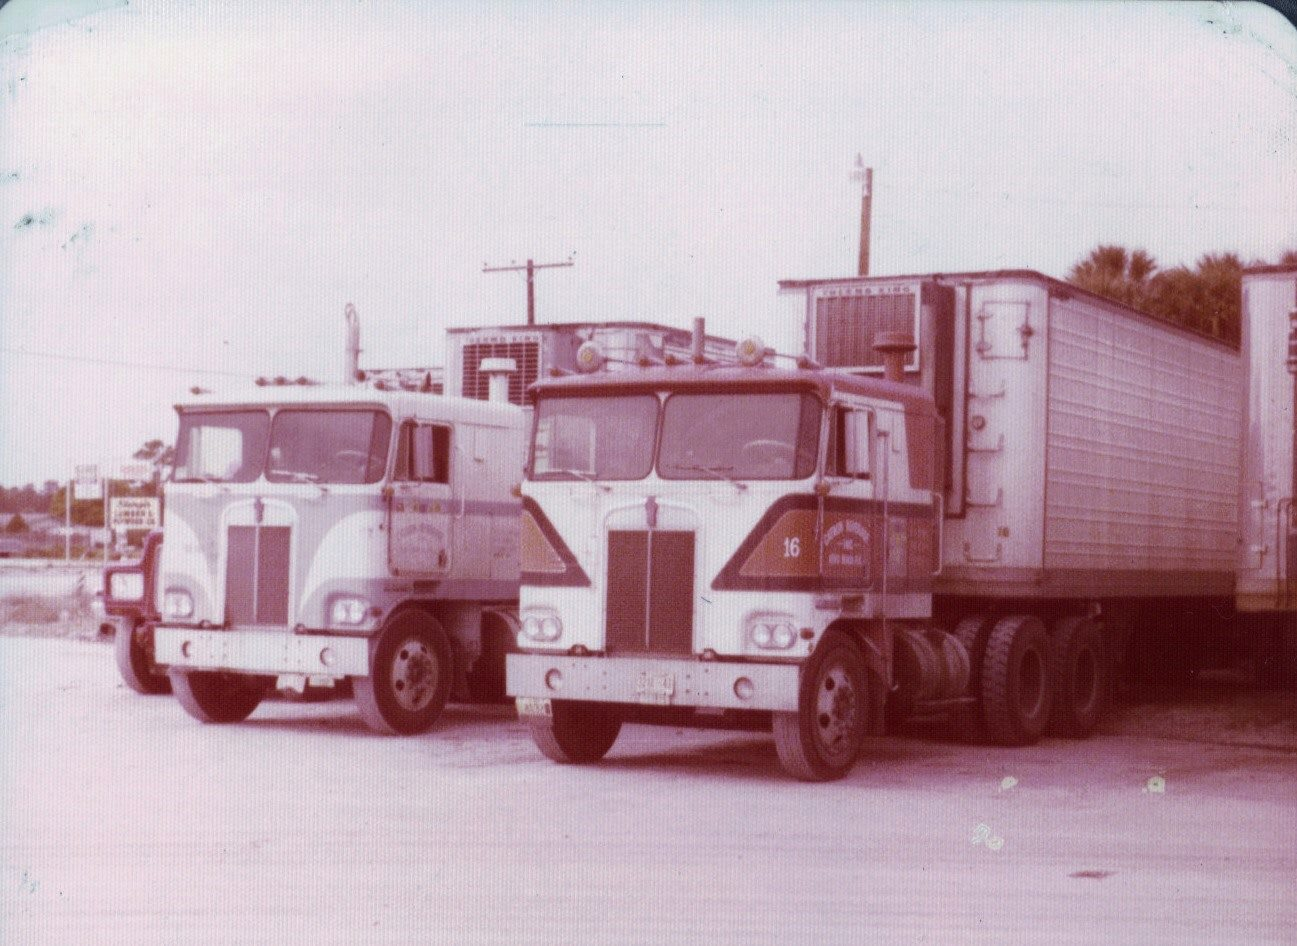 K-100-1975-route-60-Vero-Beach